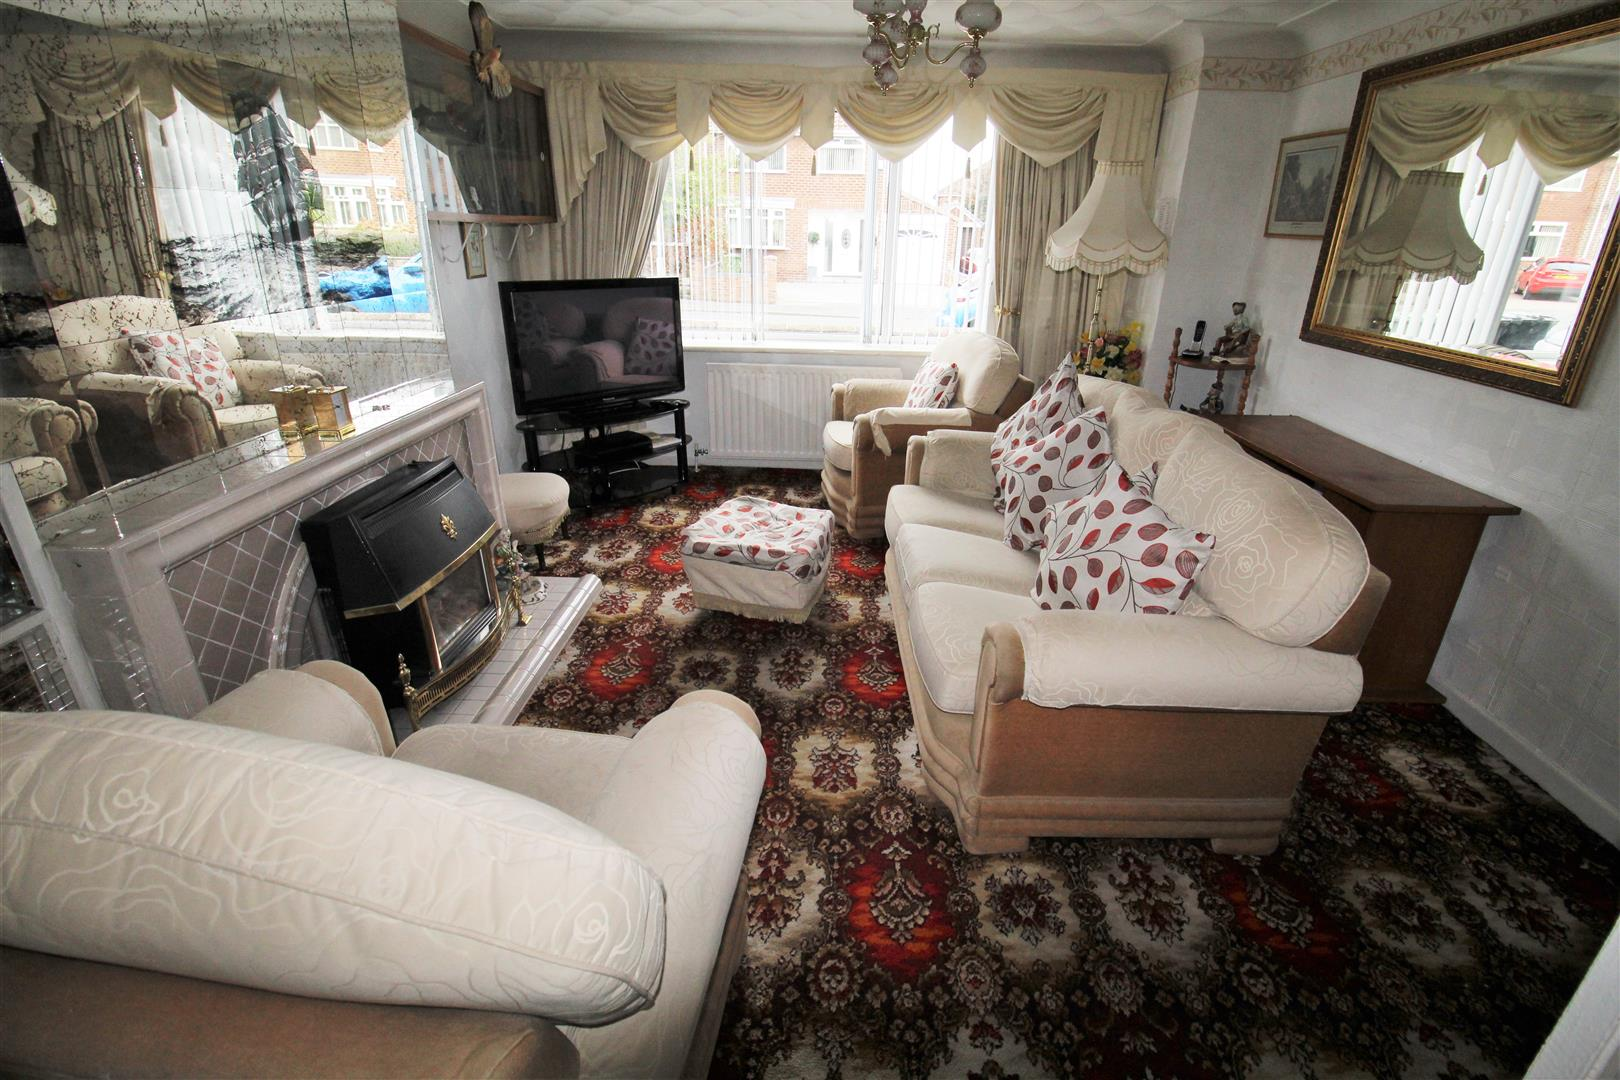 3 Bedrooms, House - Semi-Detached, Bull Bridge Lane, Liverpool